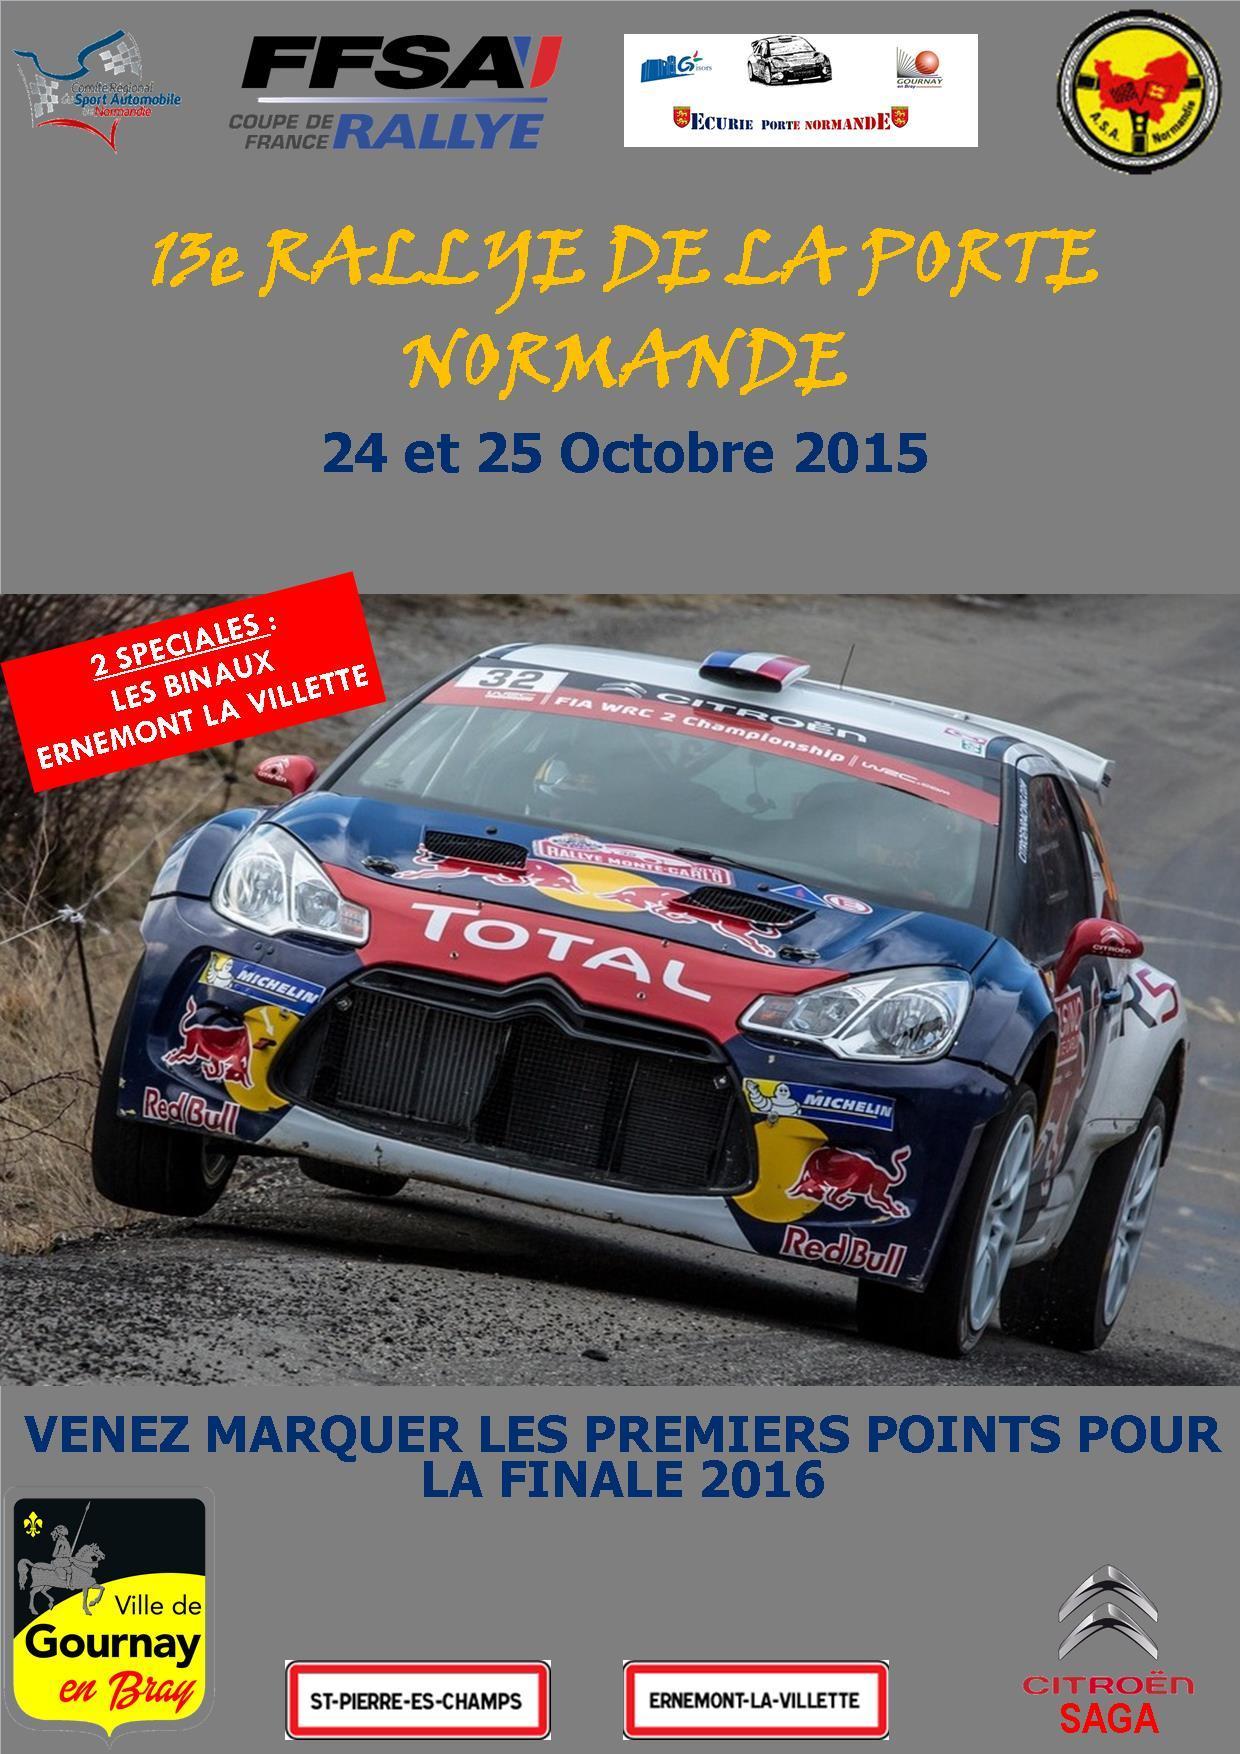 Rallye de la Porte Normande 2015 Affiche